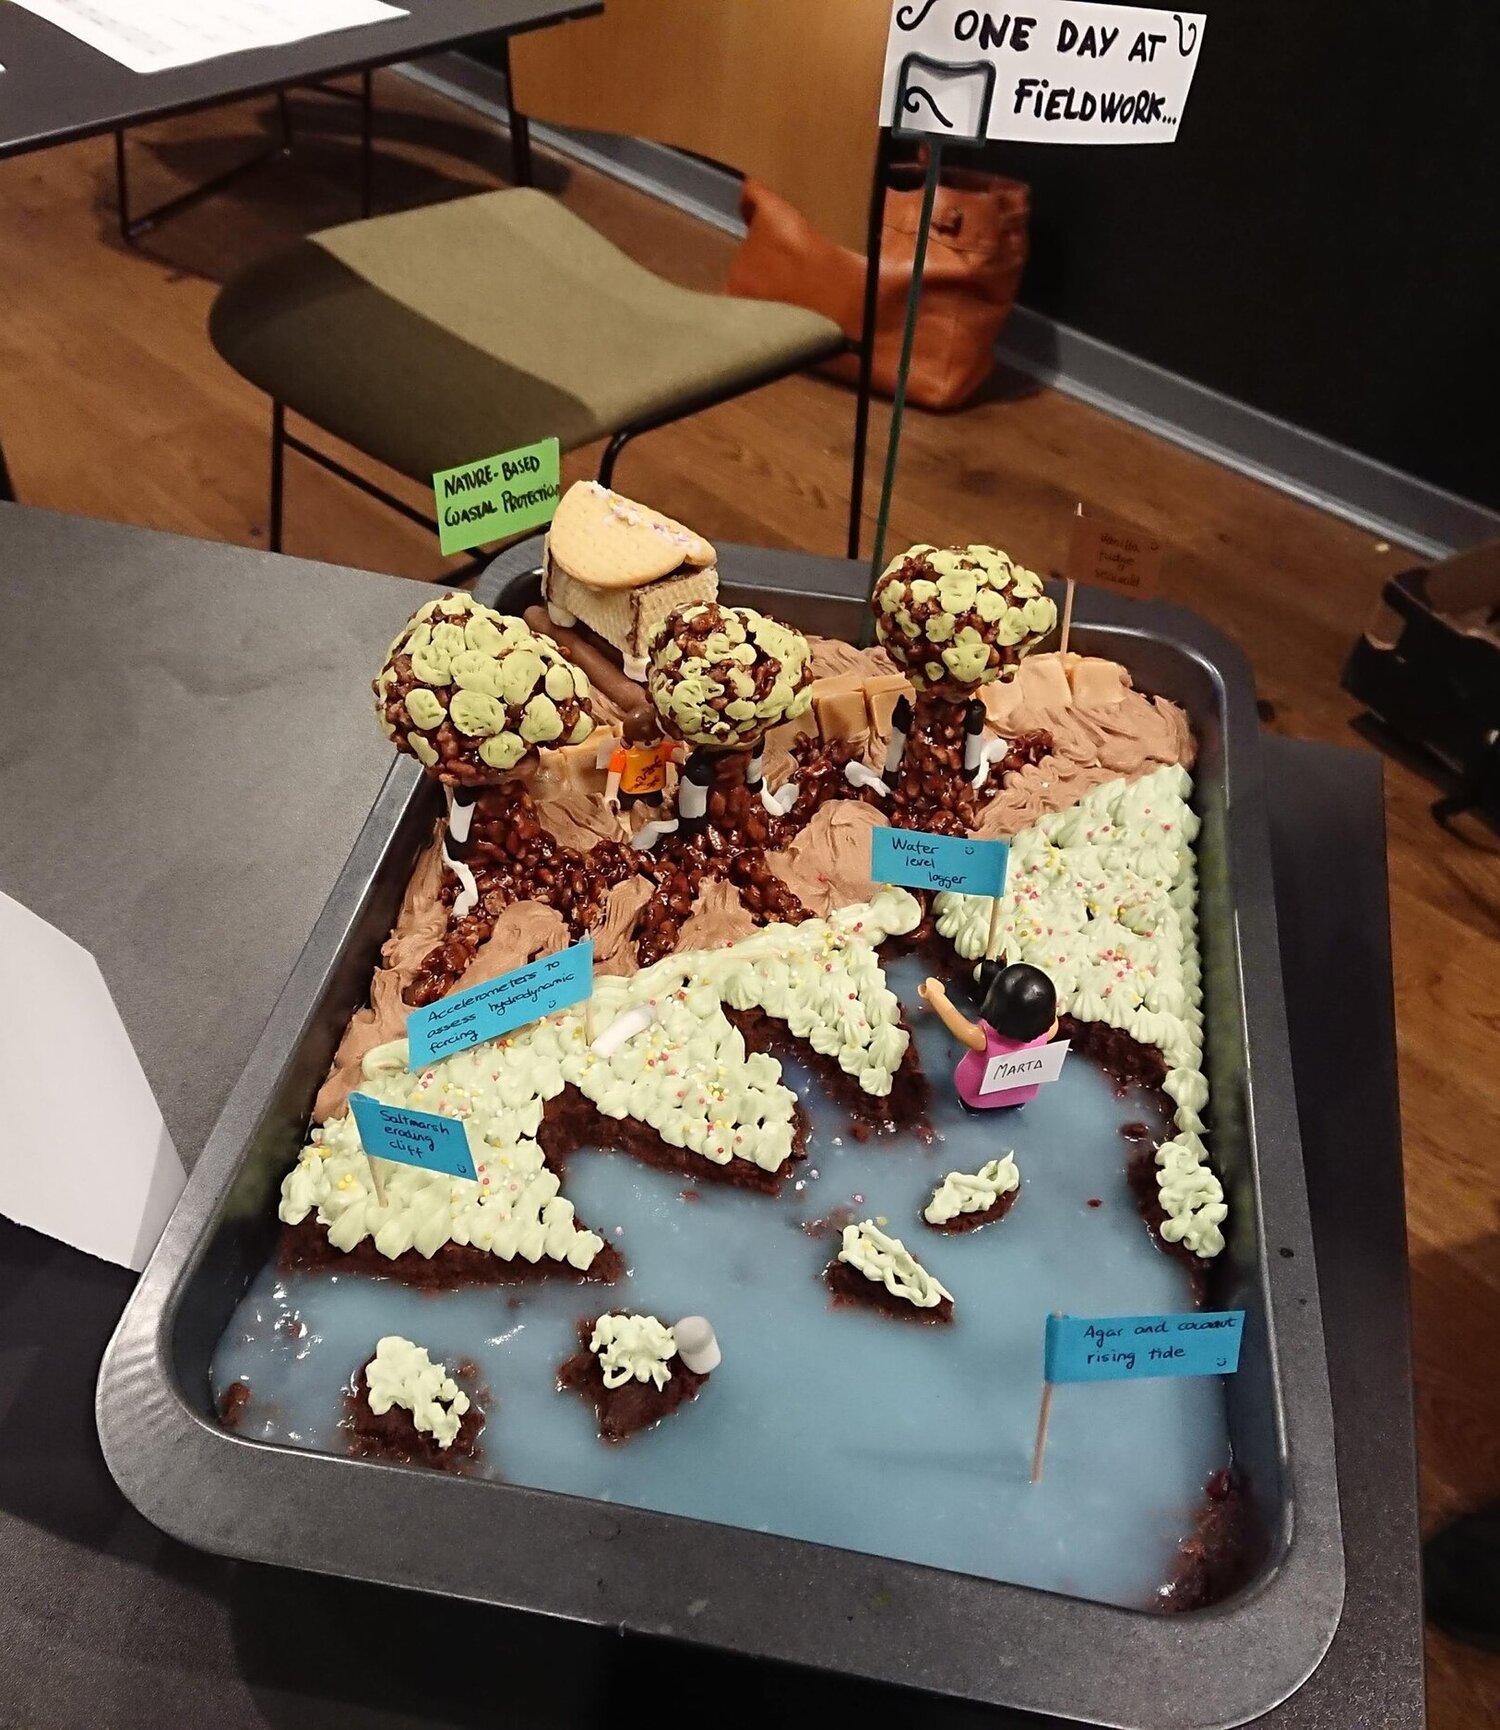 One Day at Fieldwork Bake